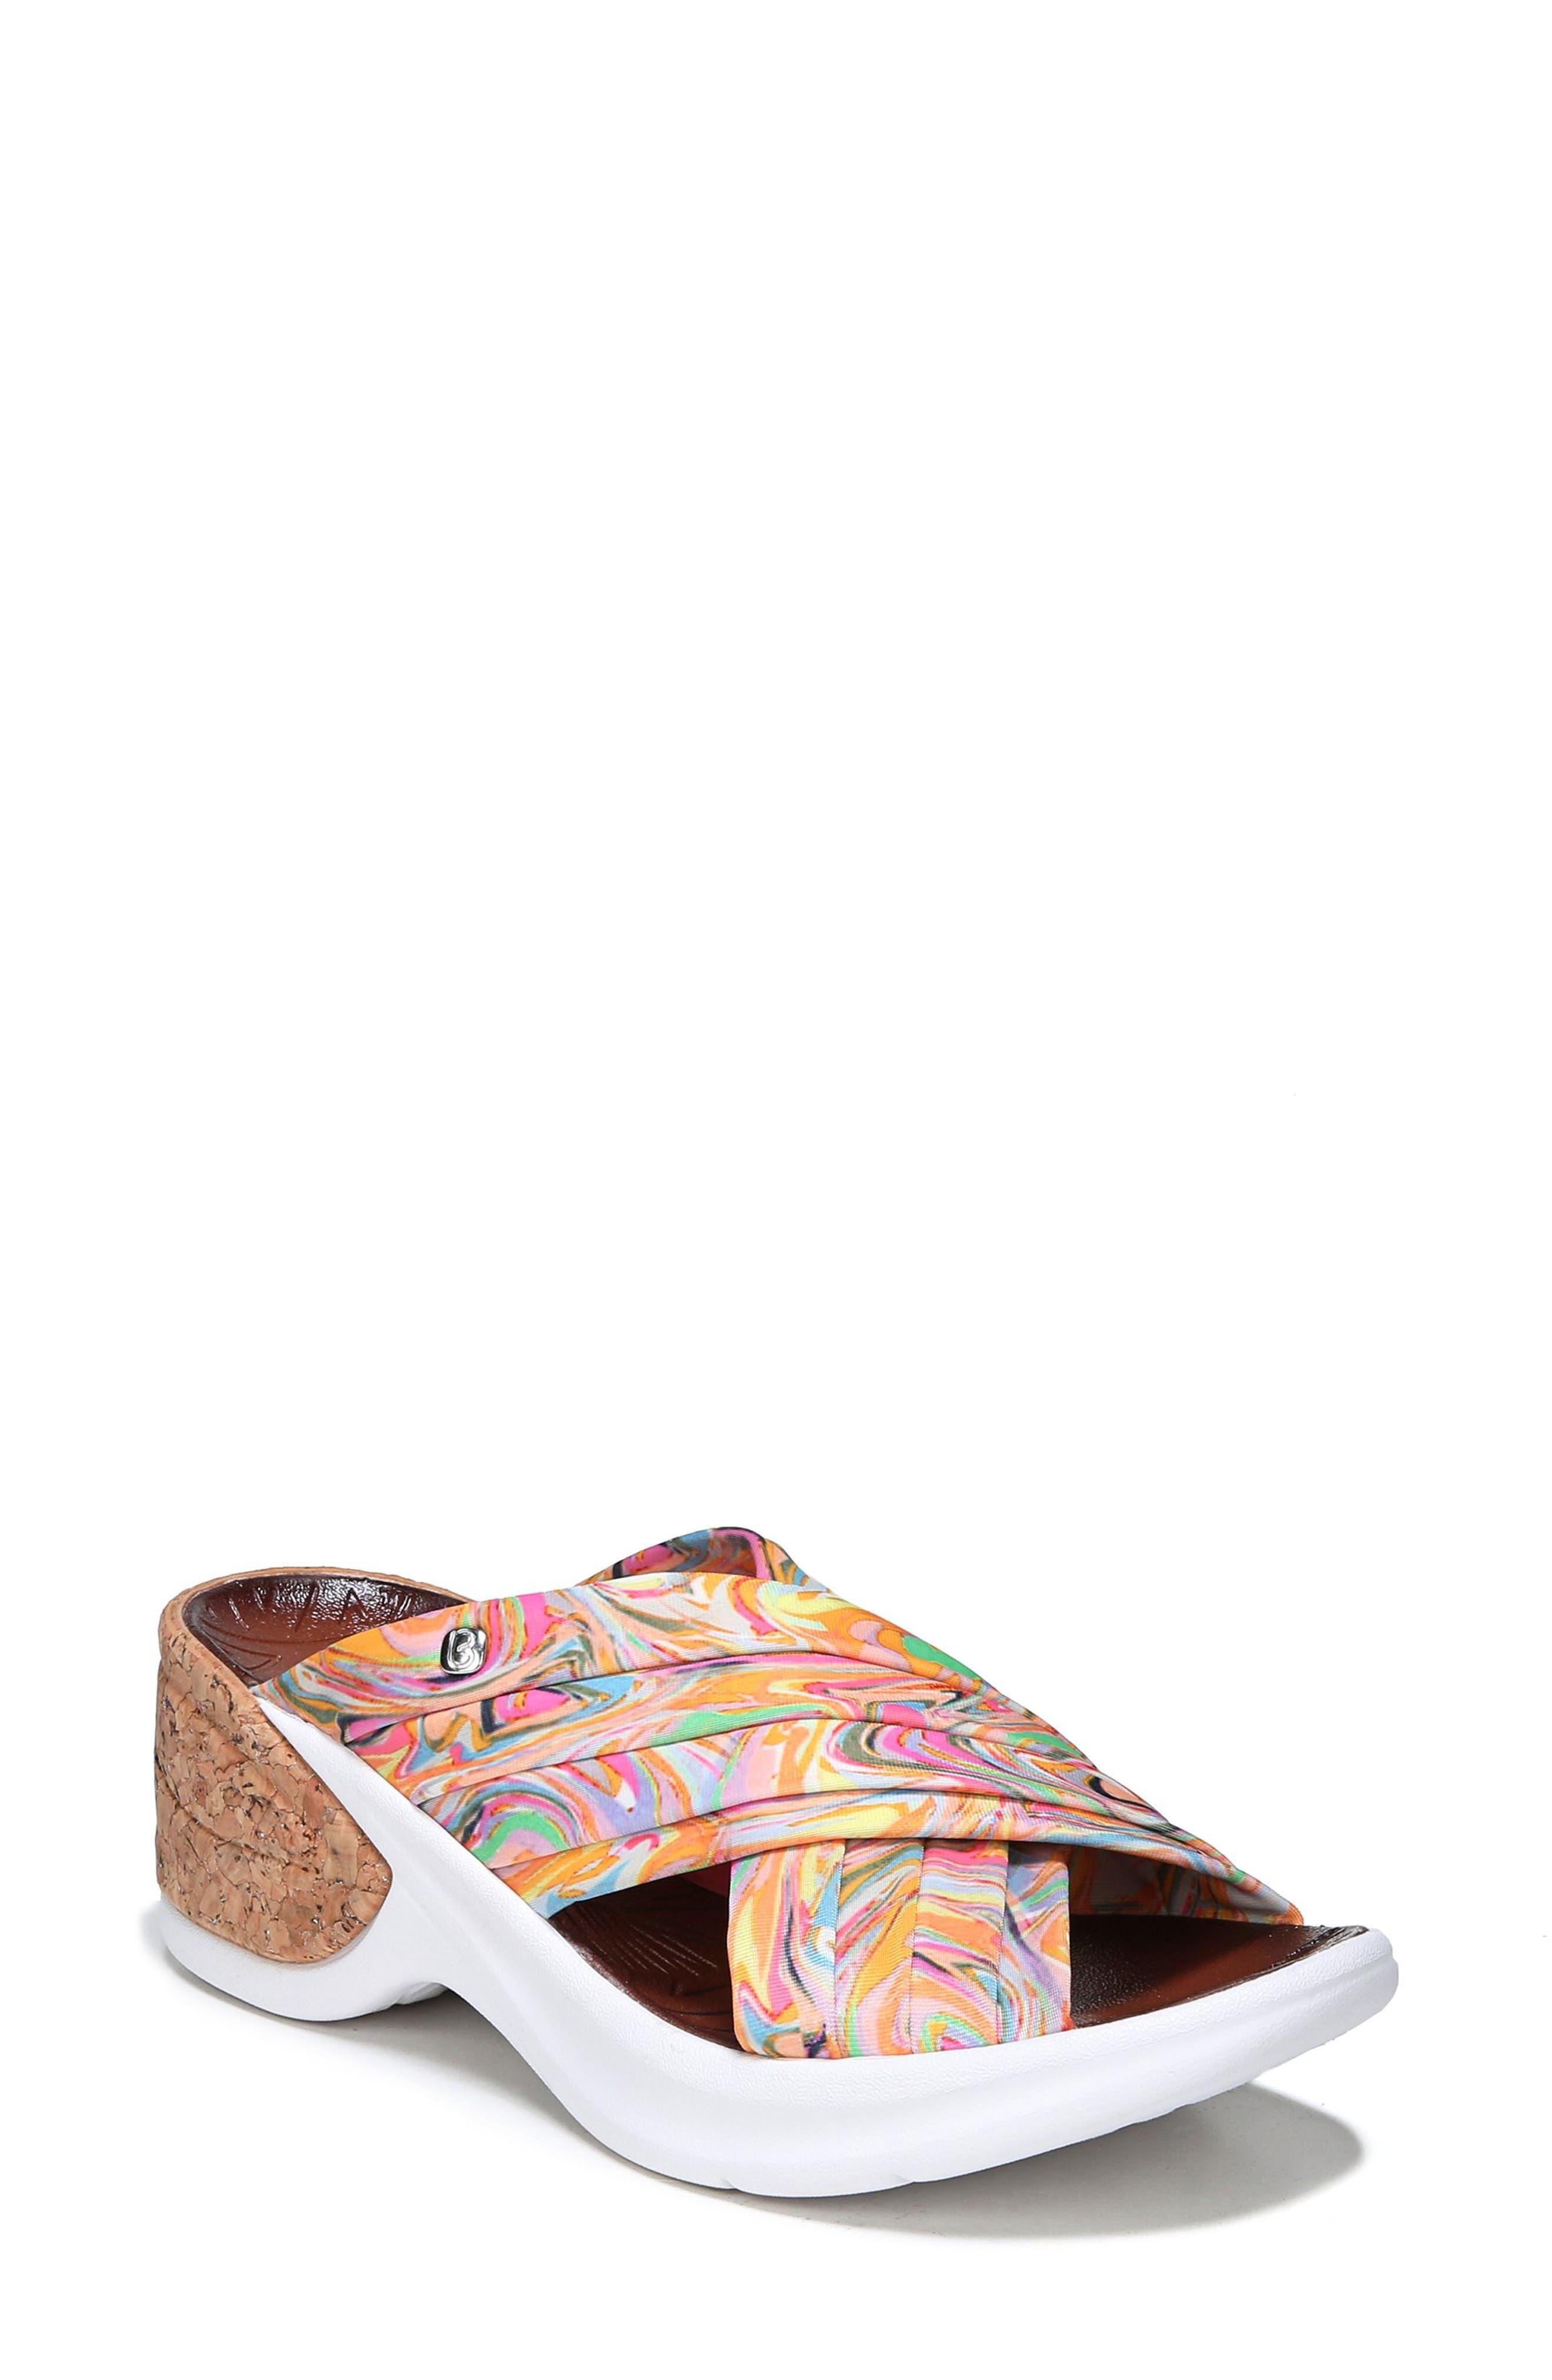 Knockout Slide Sandal,                         Main,                         color, MULTI FABRIC